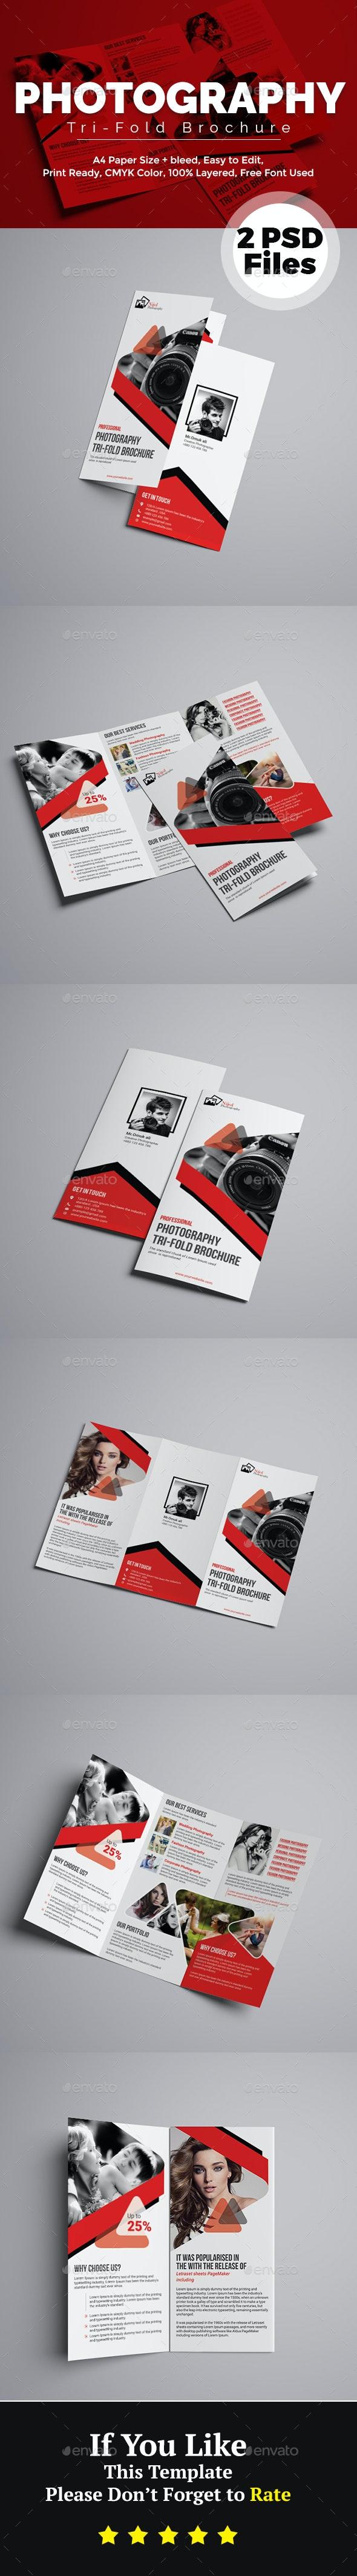 Photography Tri-Fold Brochure - Brochures Print Templates